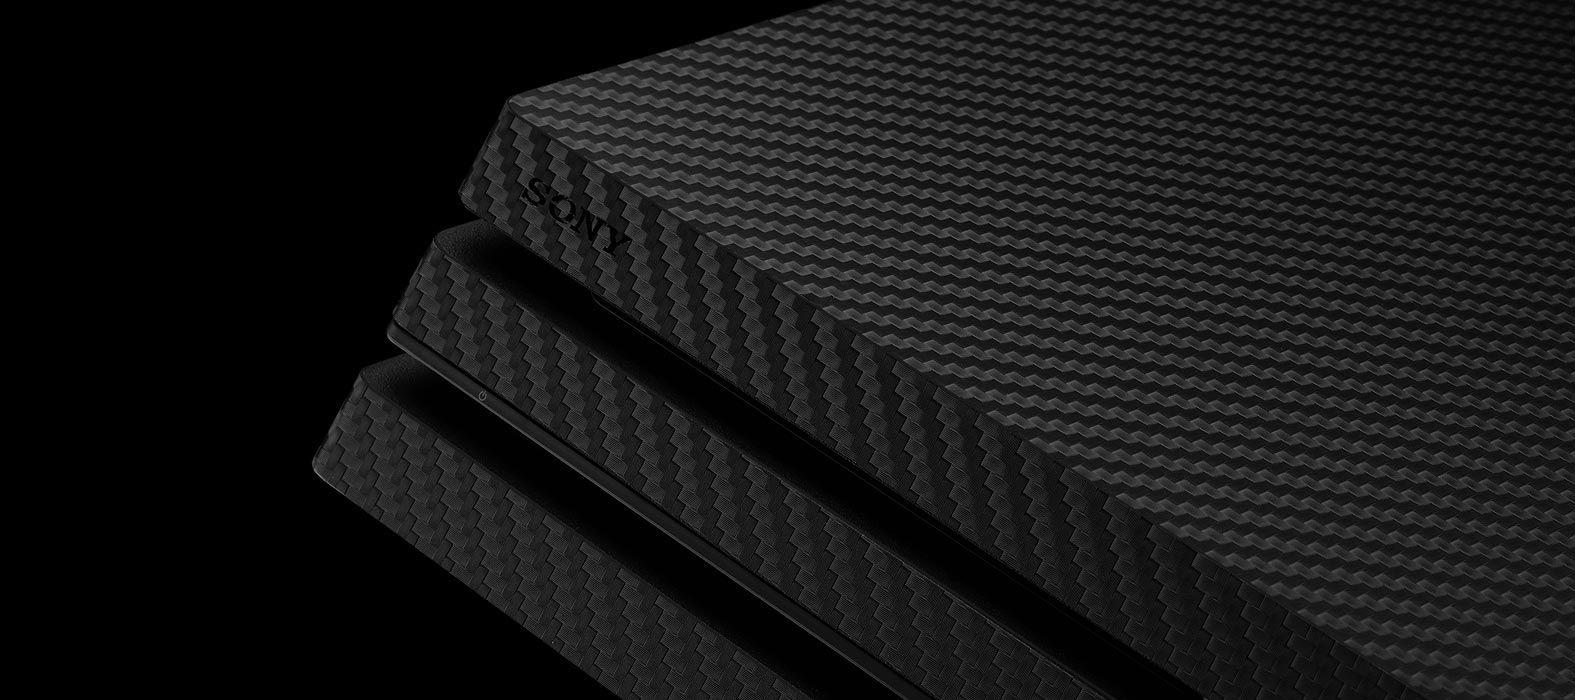 PS4 Pro Carbon Fiber Skins